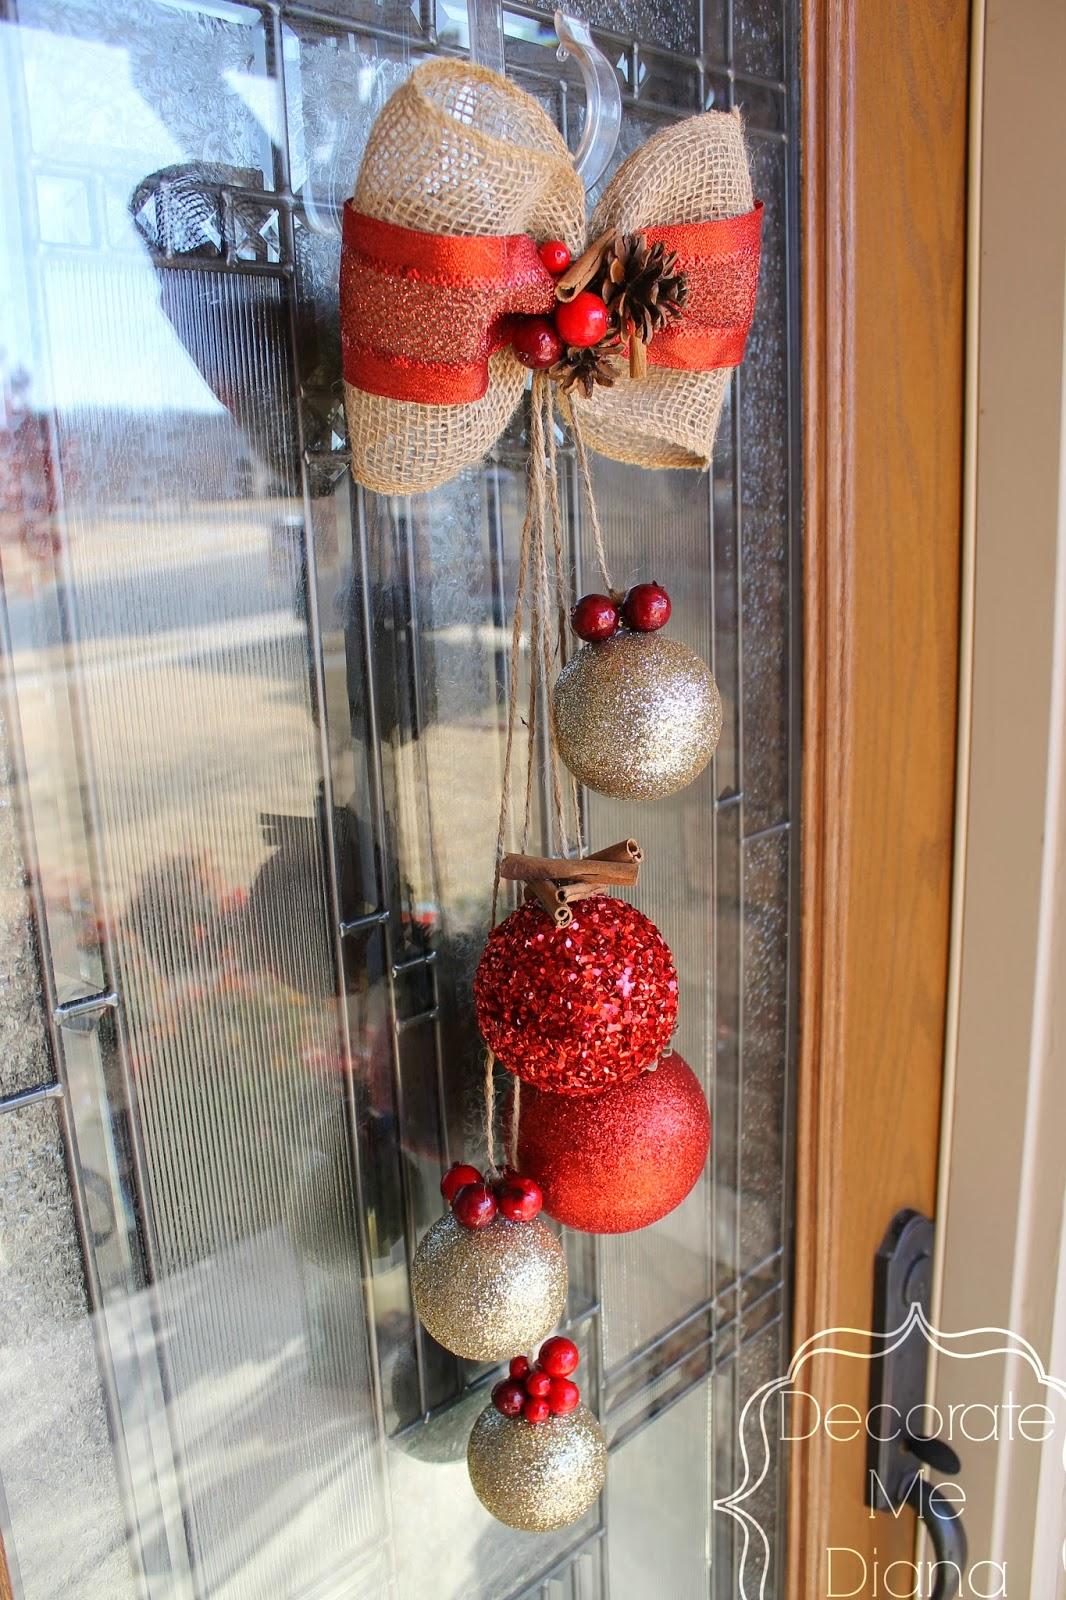 http://www.decoratemediana.com/2013/12/deconstructed-christmas-wreath.html